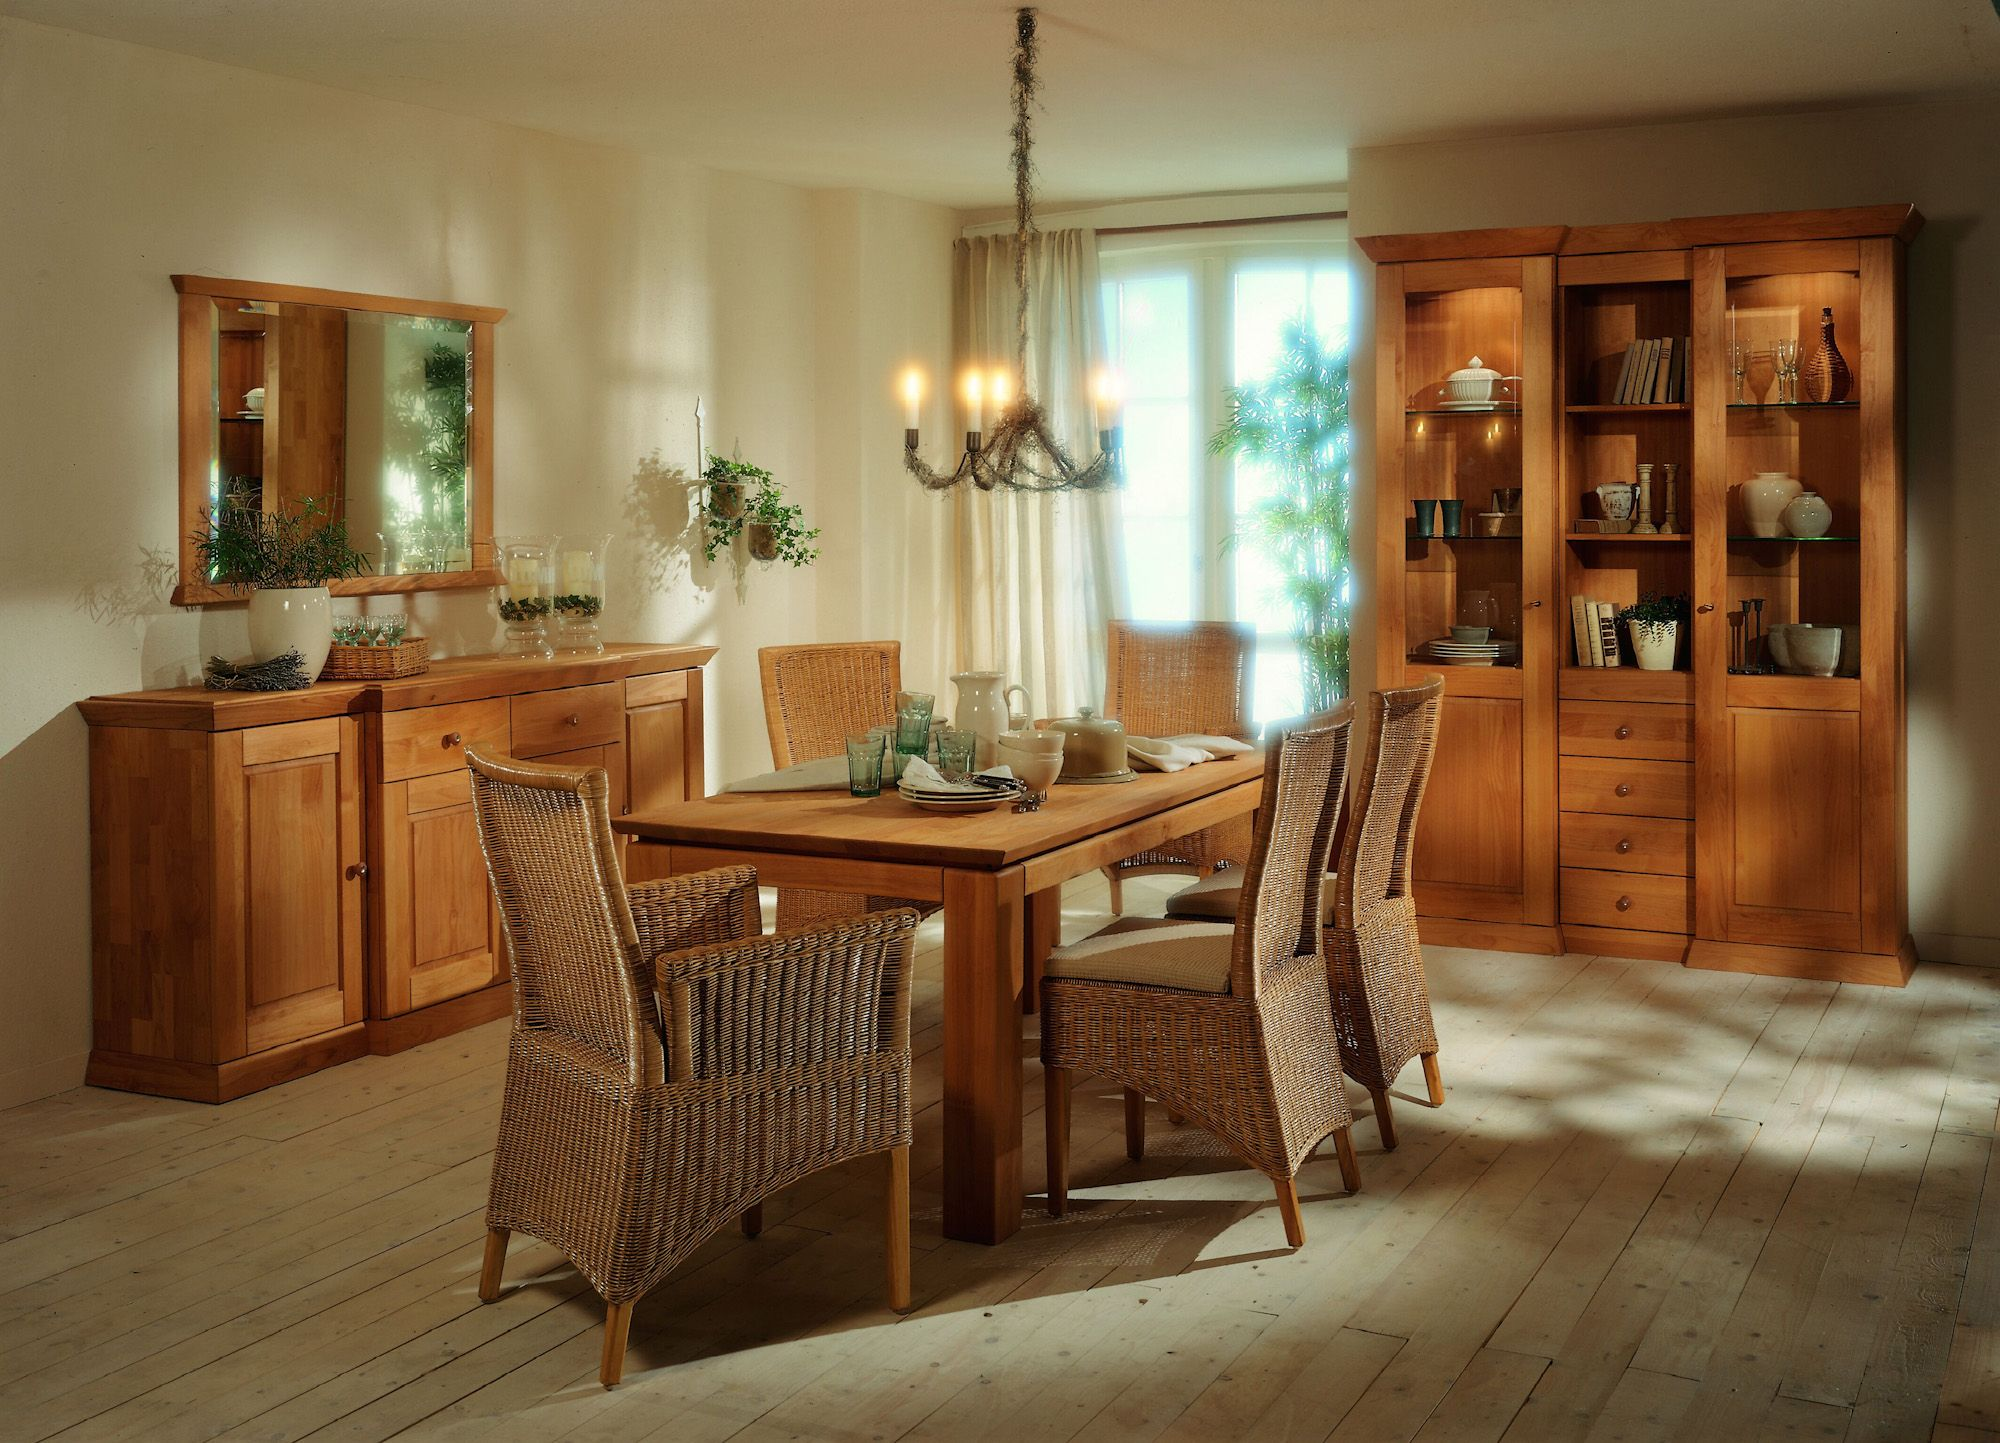 esszimmer massiv cheap esszimmer massiv with esszimmer massiv tischgruppe sitzgruppe esszimmer. Black Bedroom Furniture Sets. Home Design Ideas